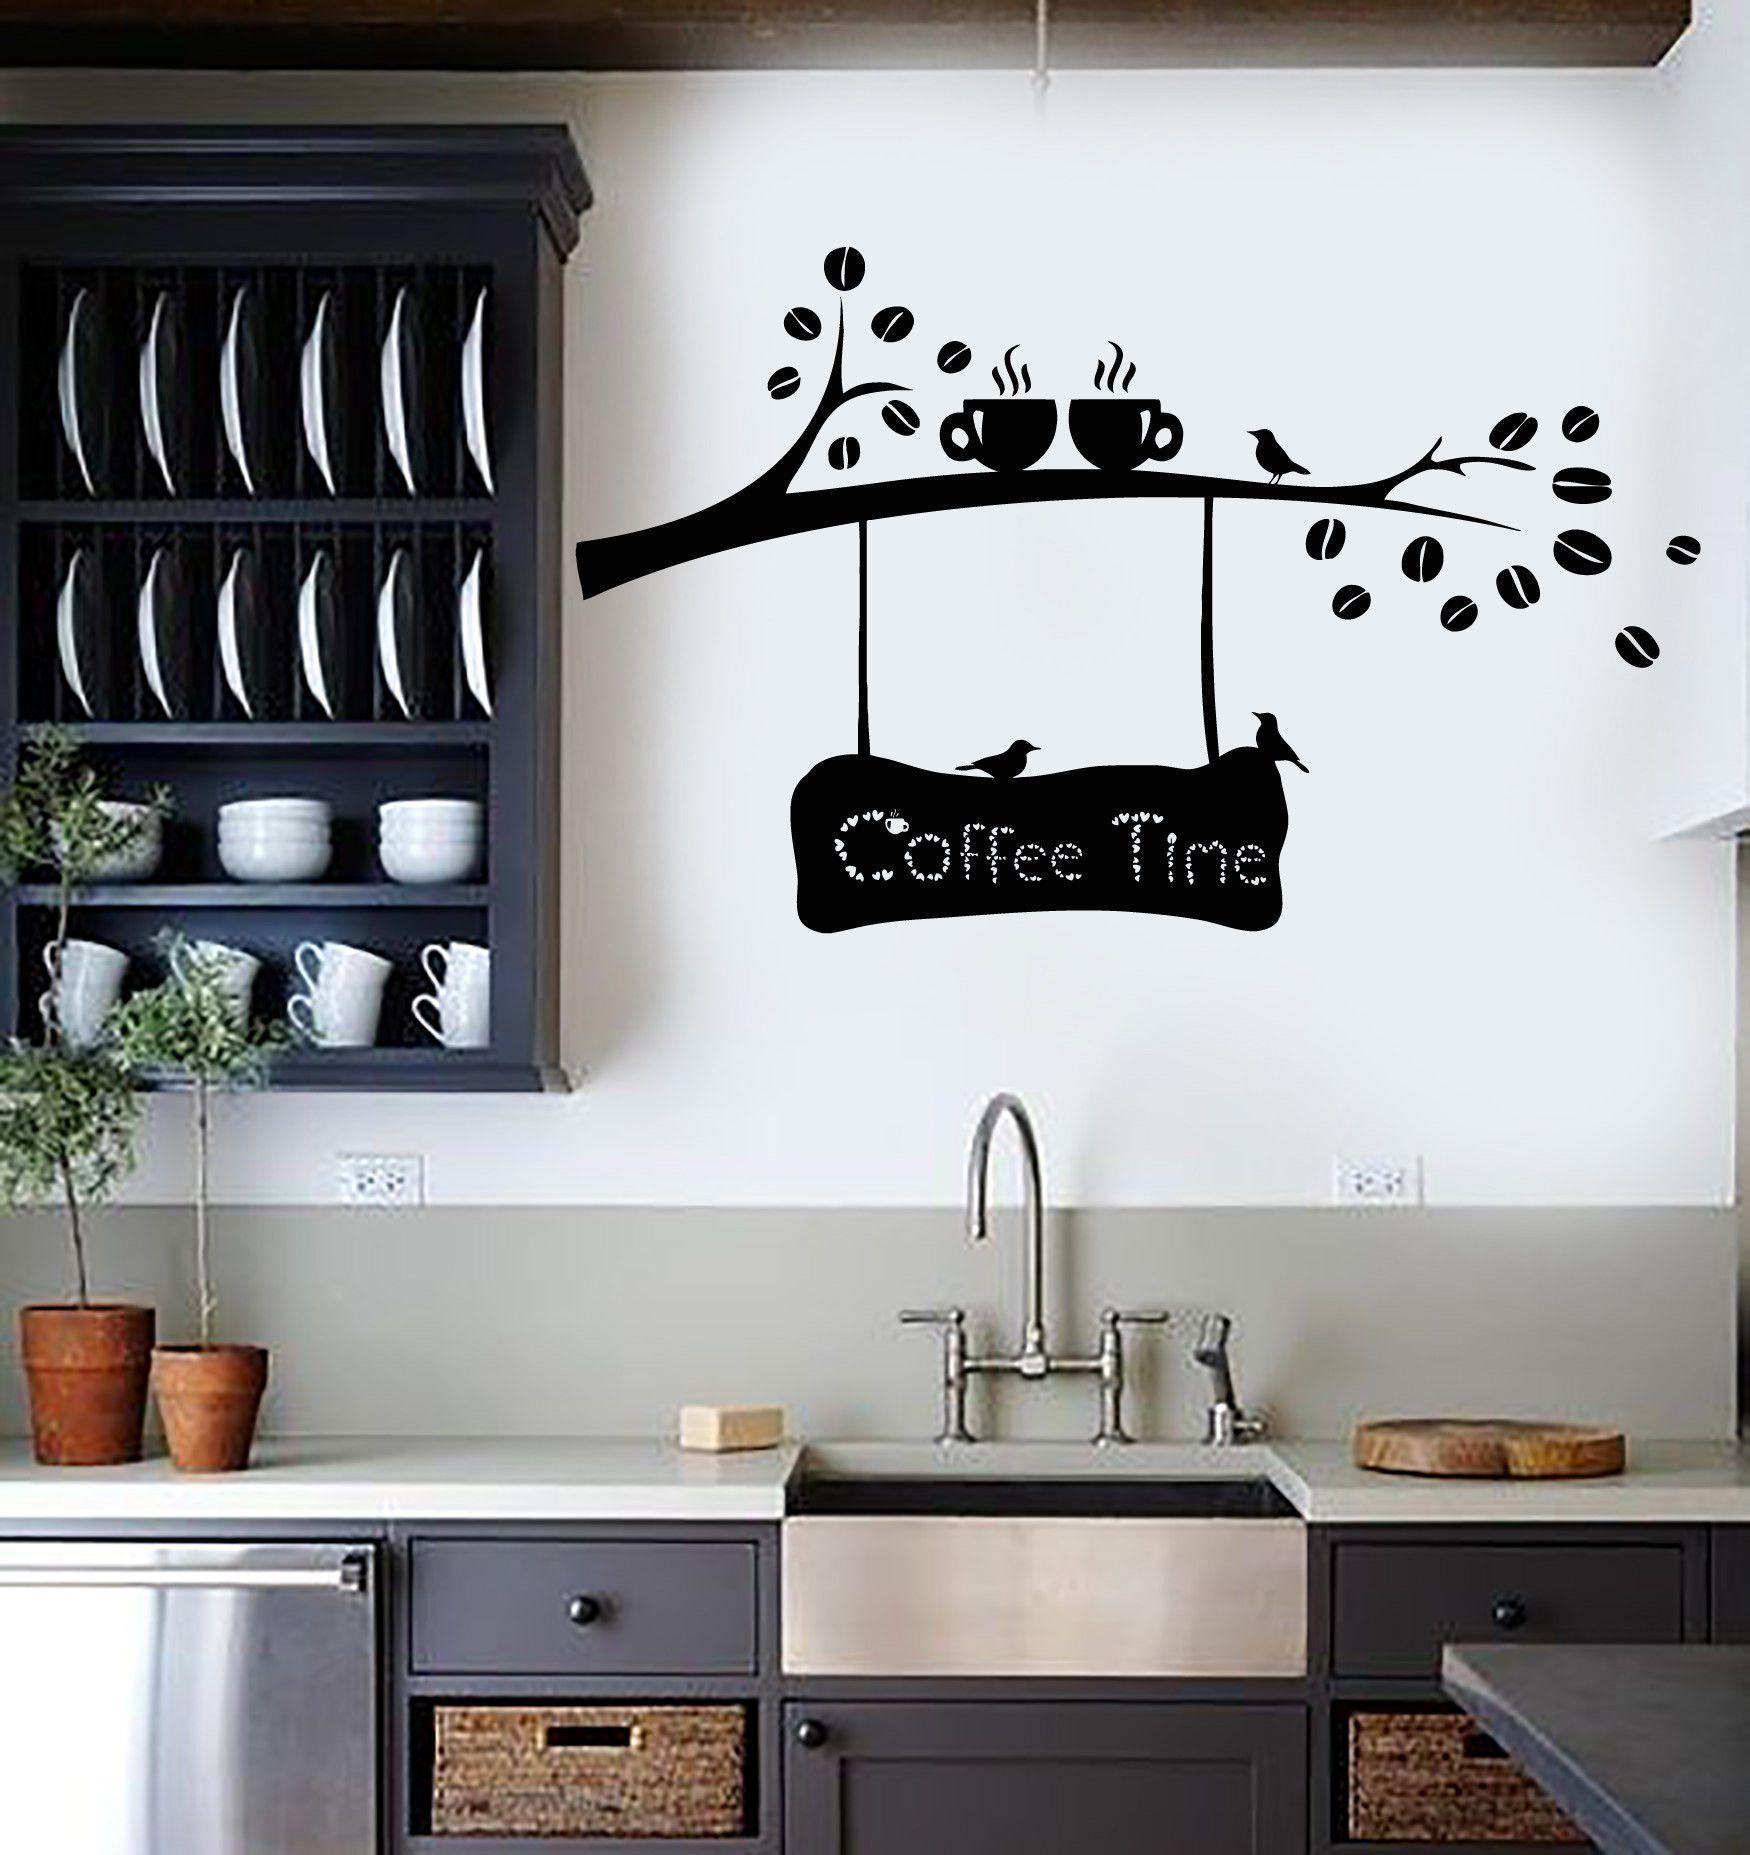 Vinyl Wall Decal Coffee Beans Branch Cup Birds Kitchen Decor Stickers Unique Gift Ig4158 Kitchen Decor Stickers Kitchen Wall Stickers Kitchen Decor